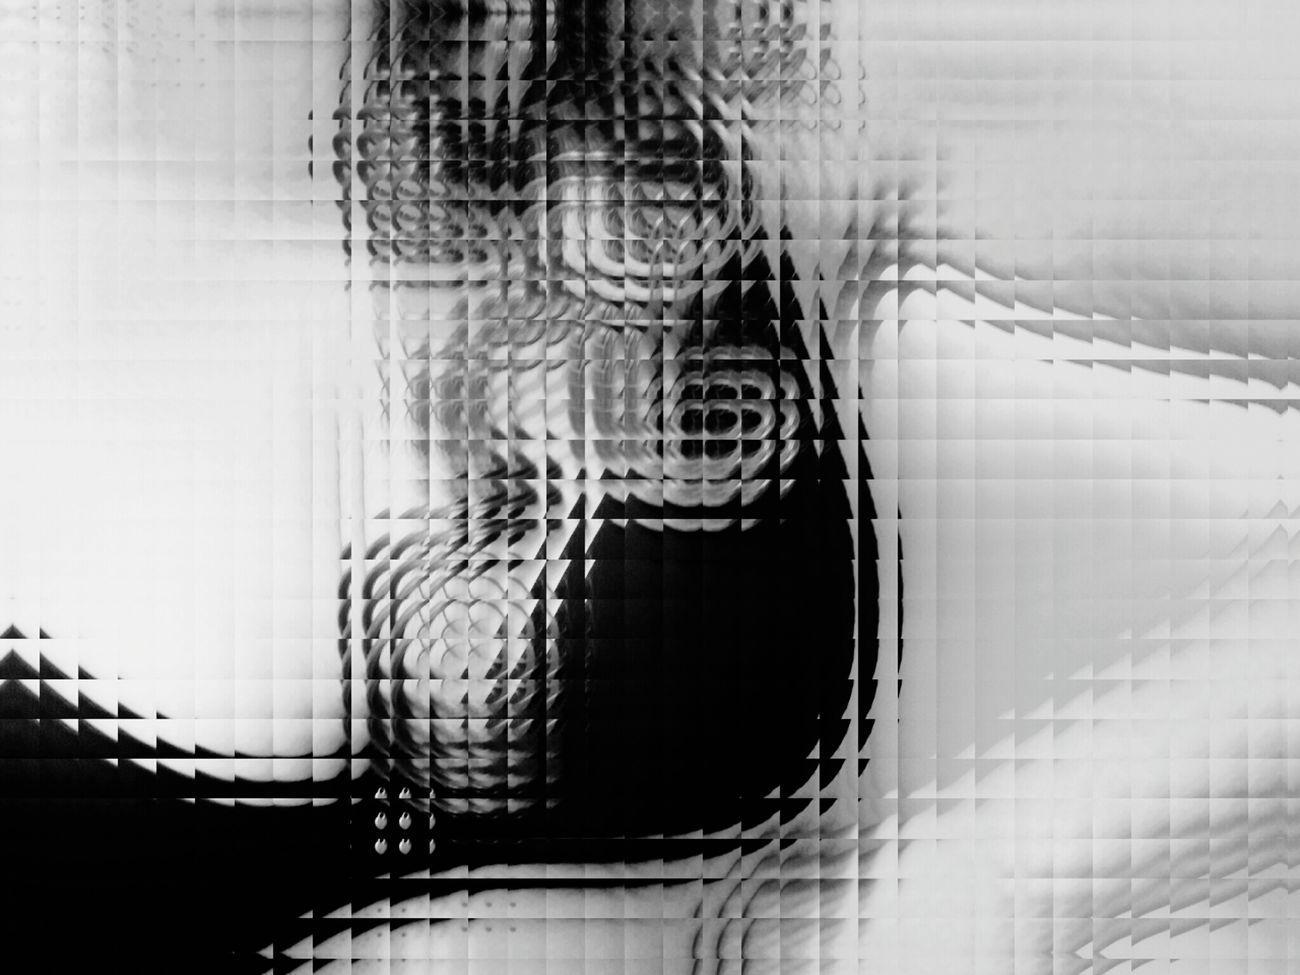 Sensual_woman Art, Drawing, Creativity Portrait Of A Woman Woman Of EyeEm Selfie ✌ Beautiful Woman Femmefatale Females Women Blackandwhitephotography